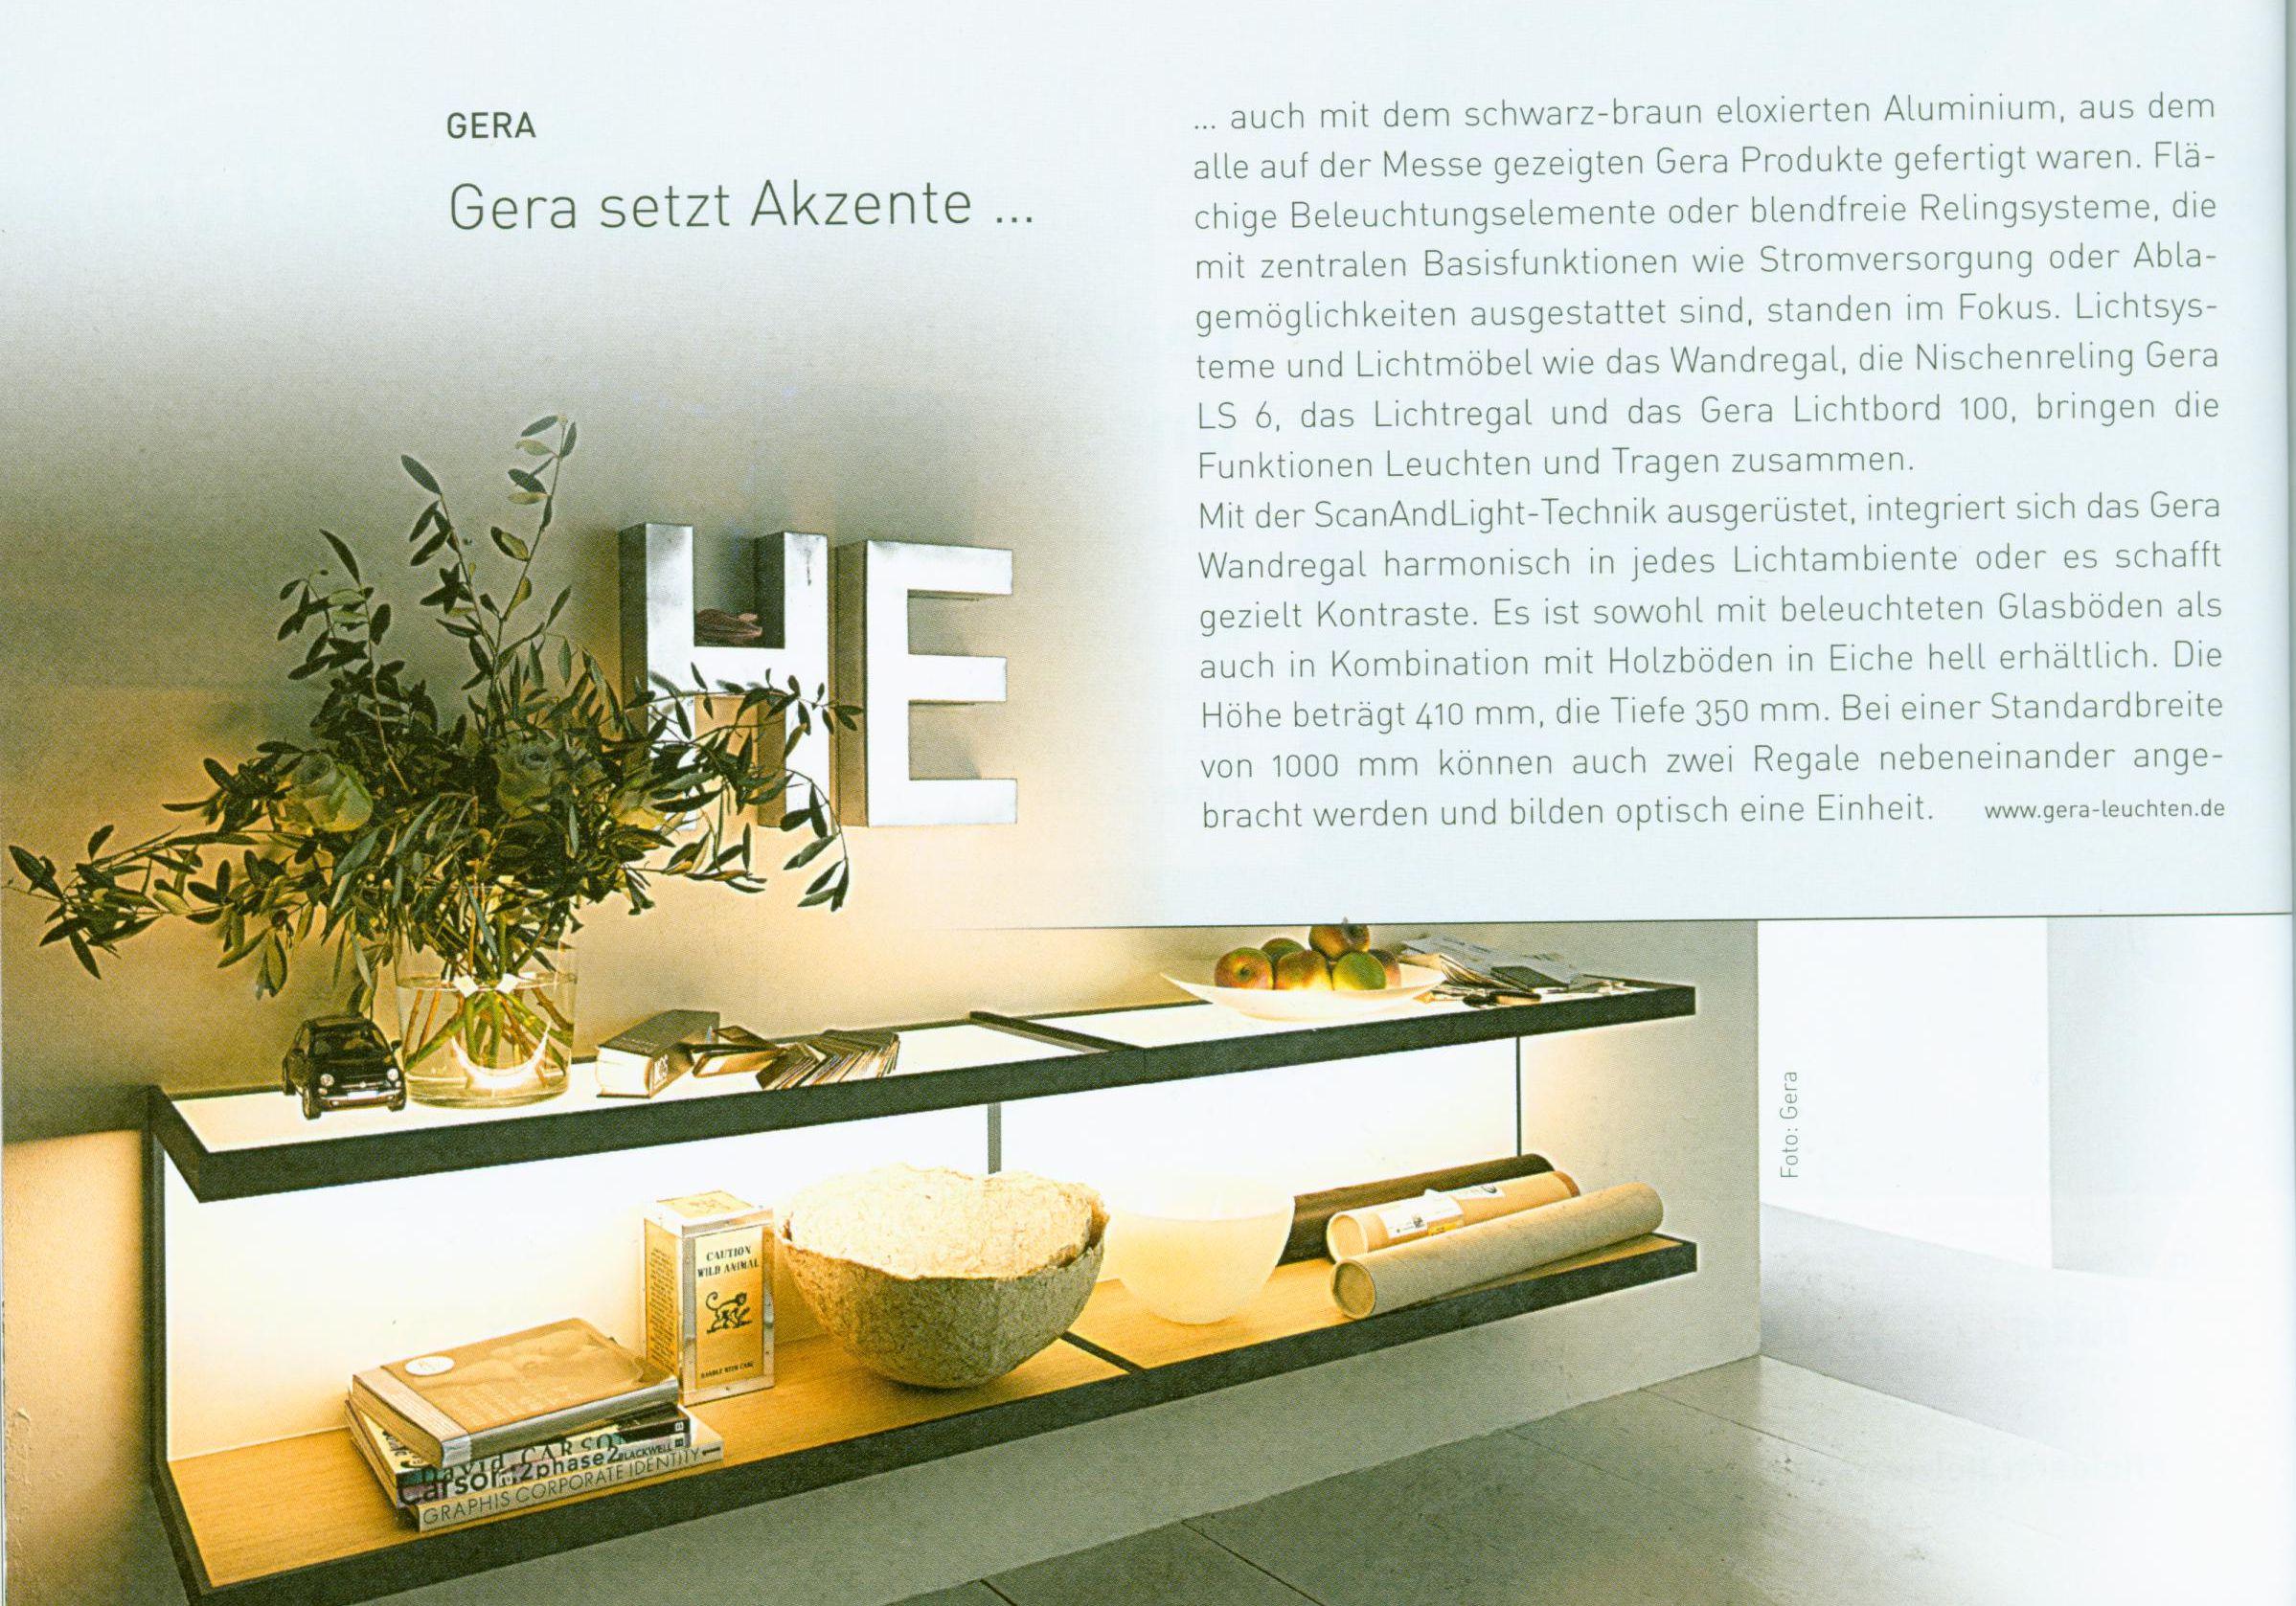 deckenleuchte k che led forum s dstaaten k che boden offene abstrakt ikea wandtattoo 3d. Black Bedroom Furniture Sets. Home Design Ideas